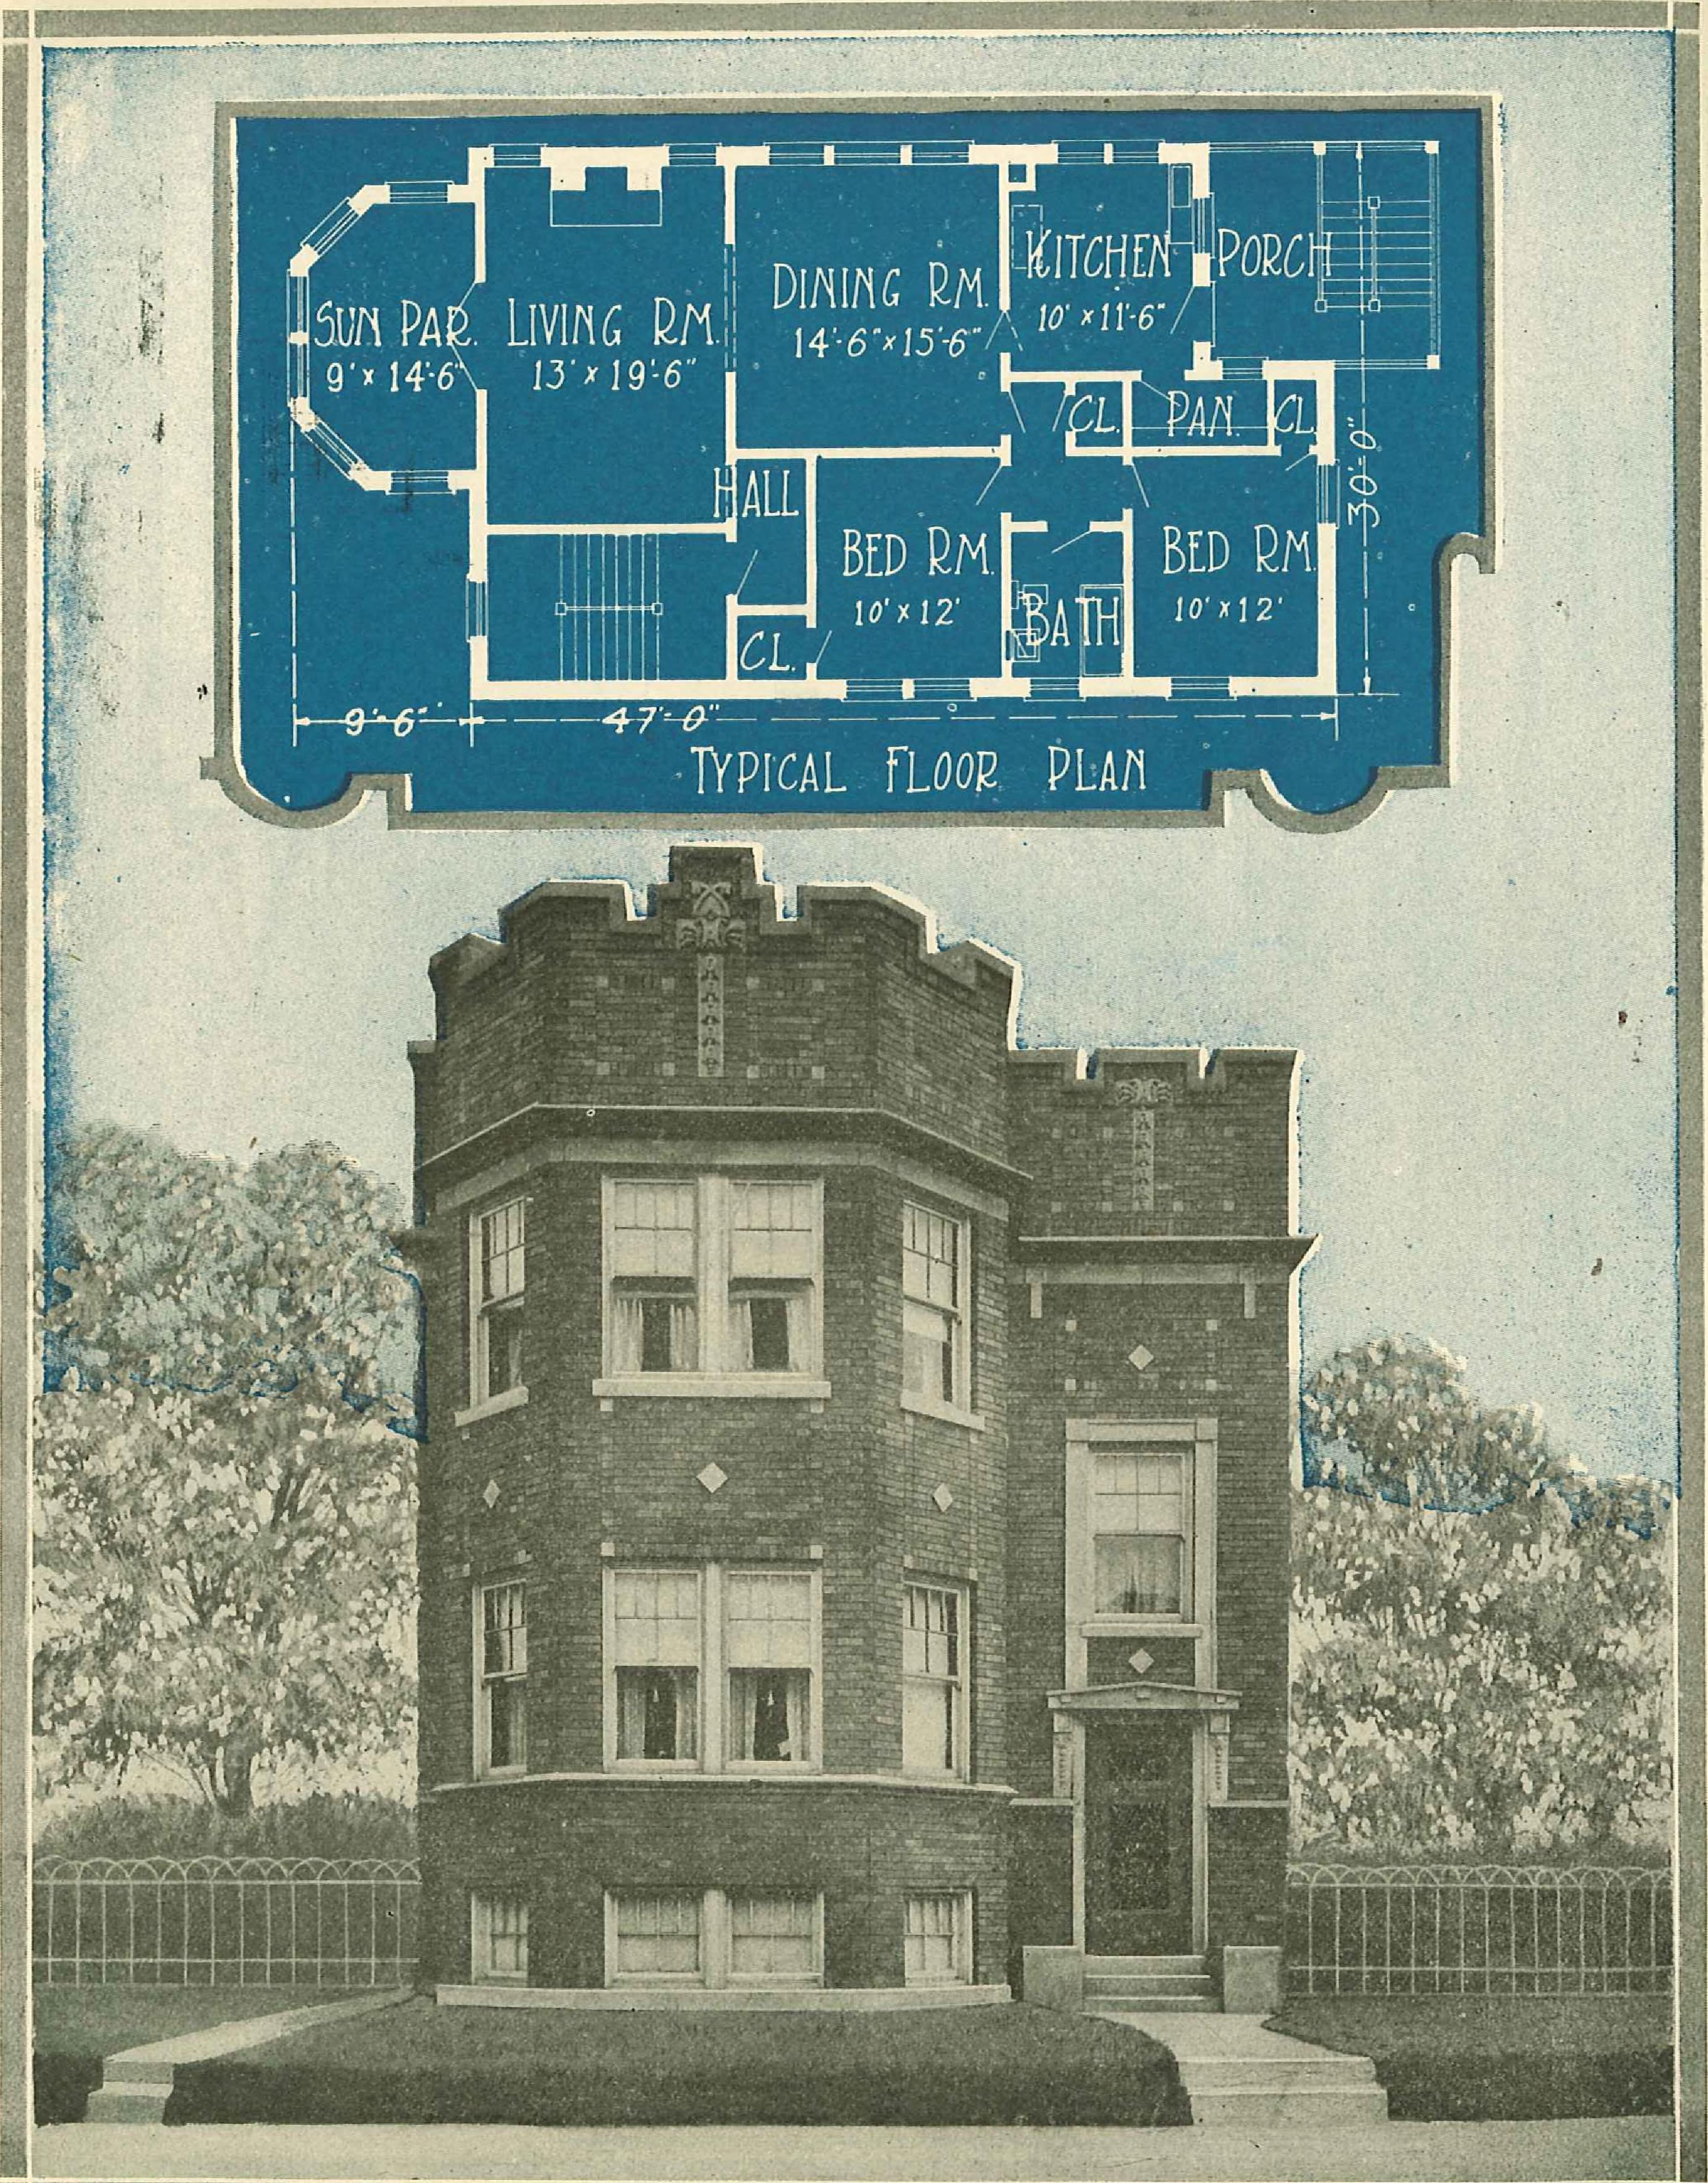 Home plan suggestions (1921) (14576782407).jpg English: Identifier: HomePlanSuggestions (find matches) Title: Home plan suggestions Year: 1921 (1920s)